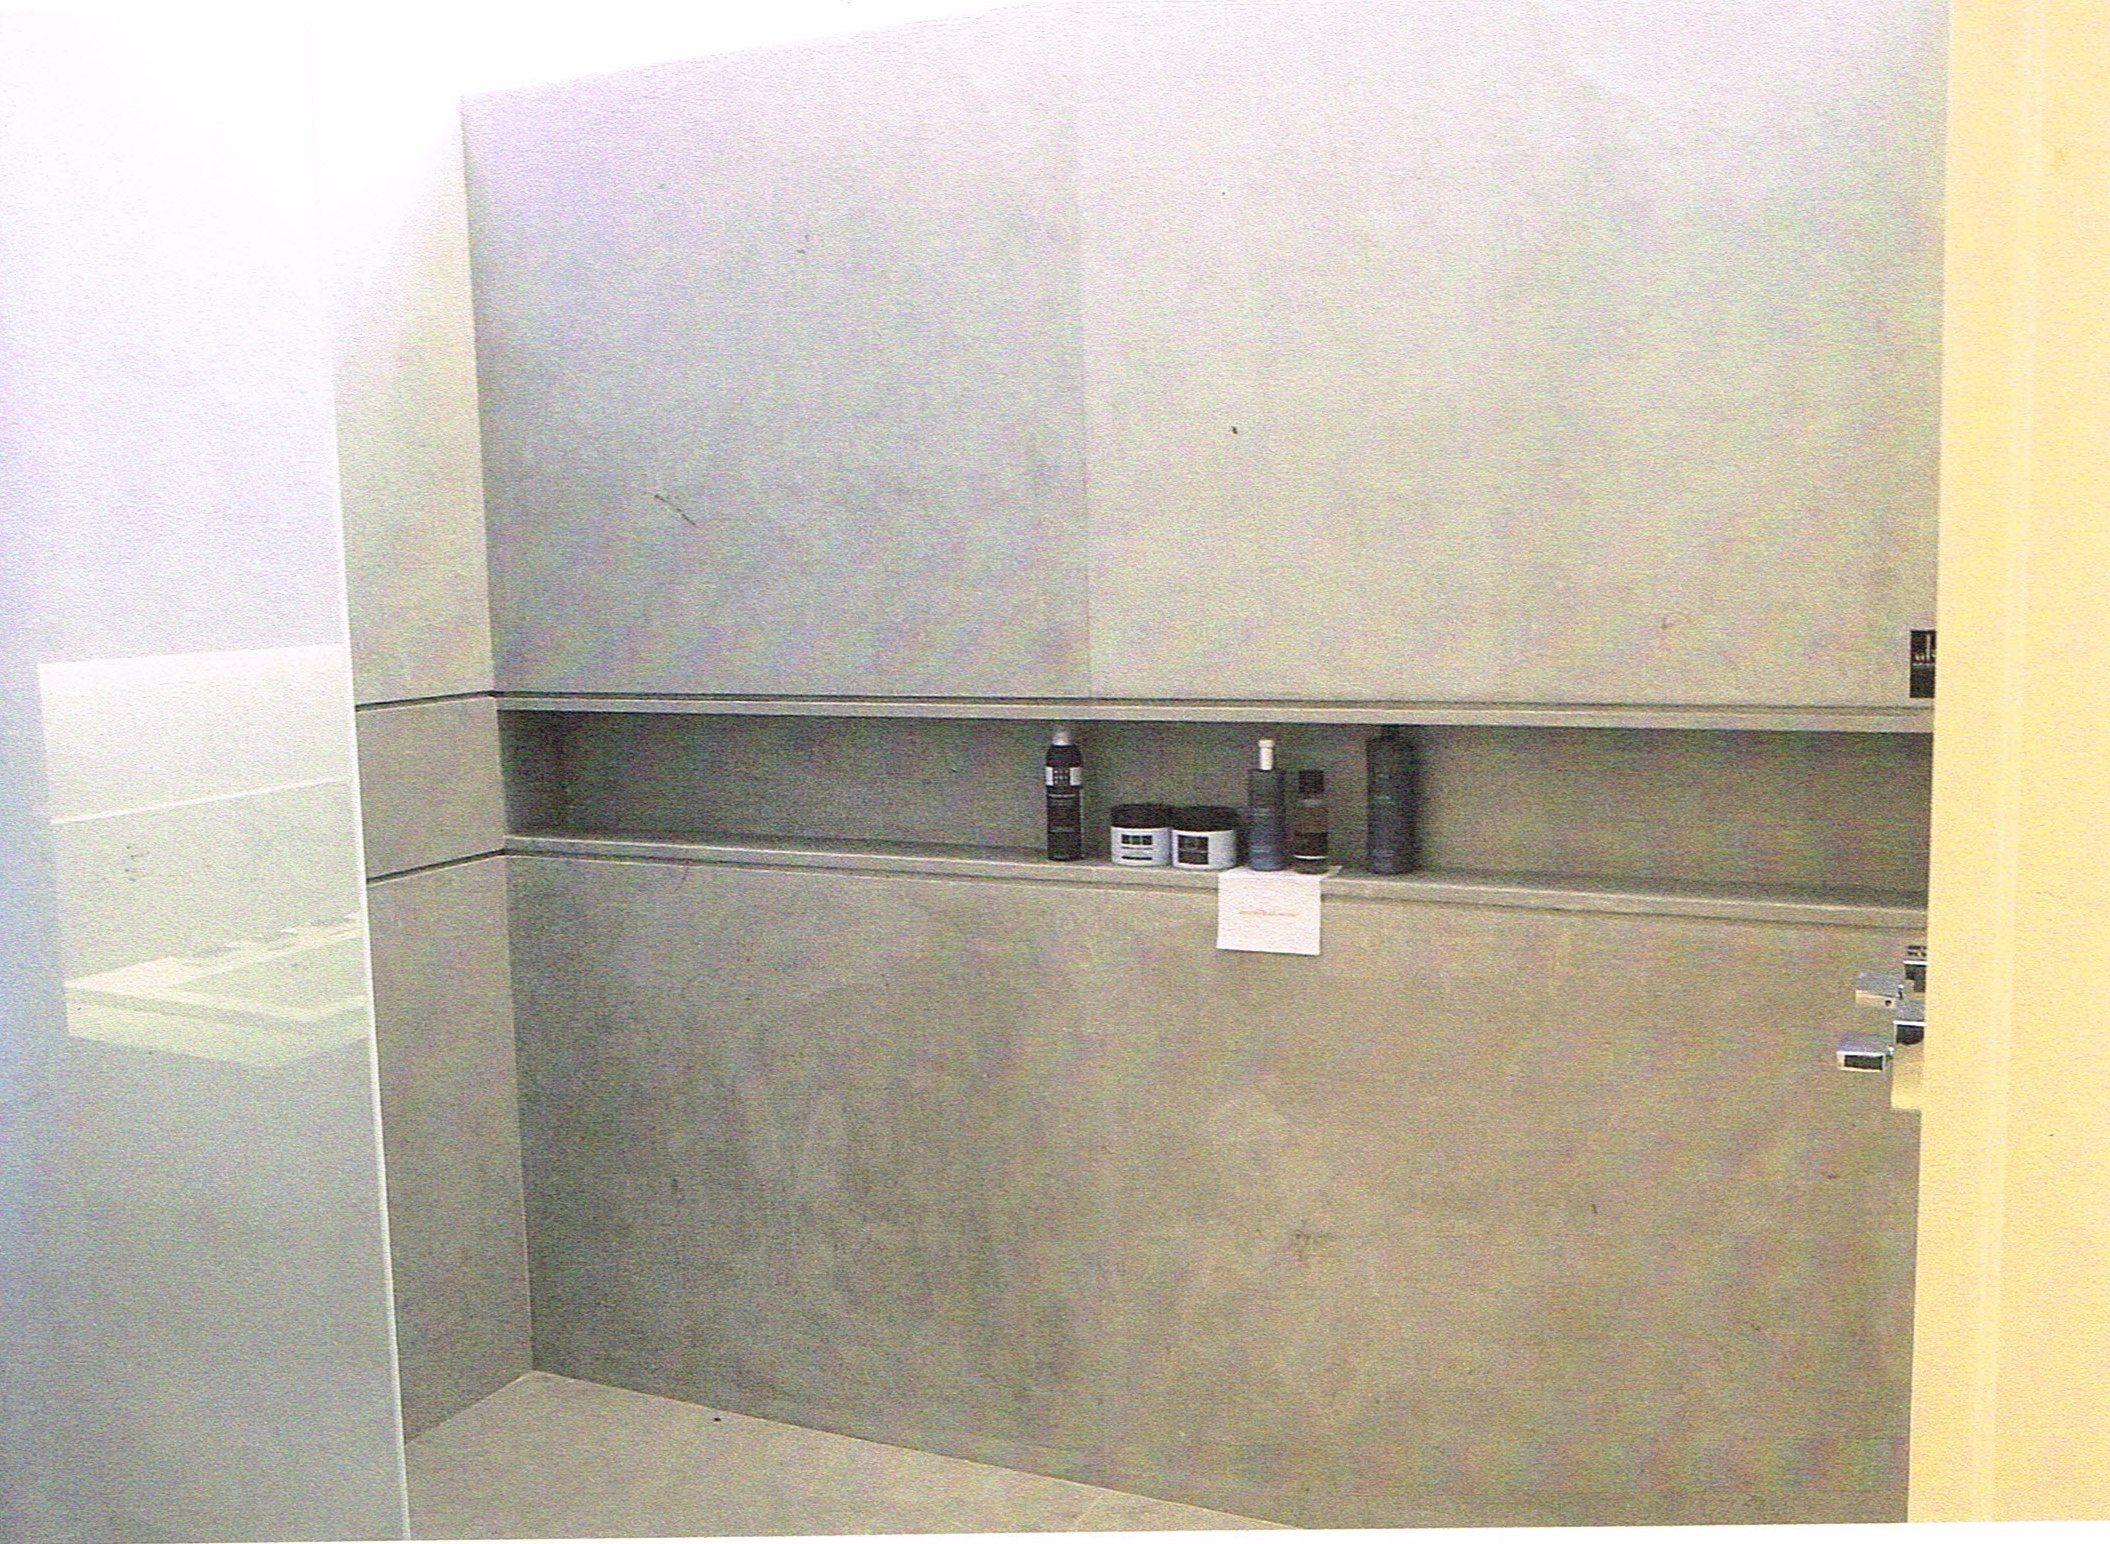 nicho para shampoo  banheiros  Pinterest  Xampus e Caixas # Nicho Para Shampoo Banheiro